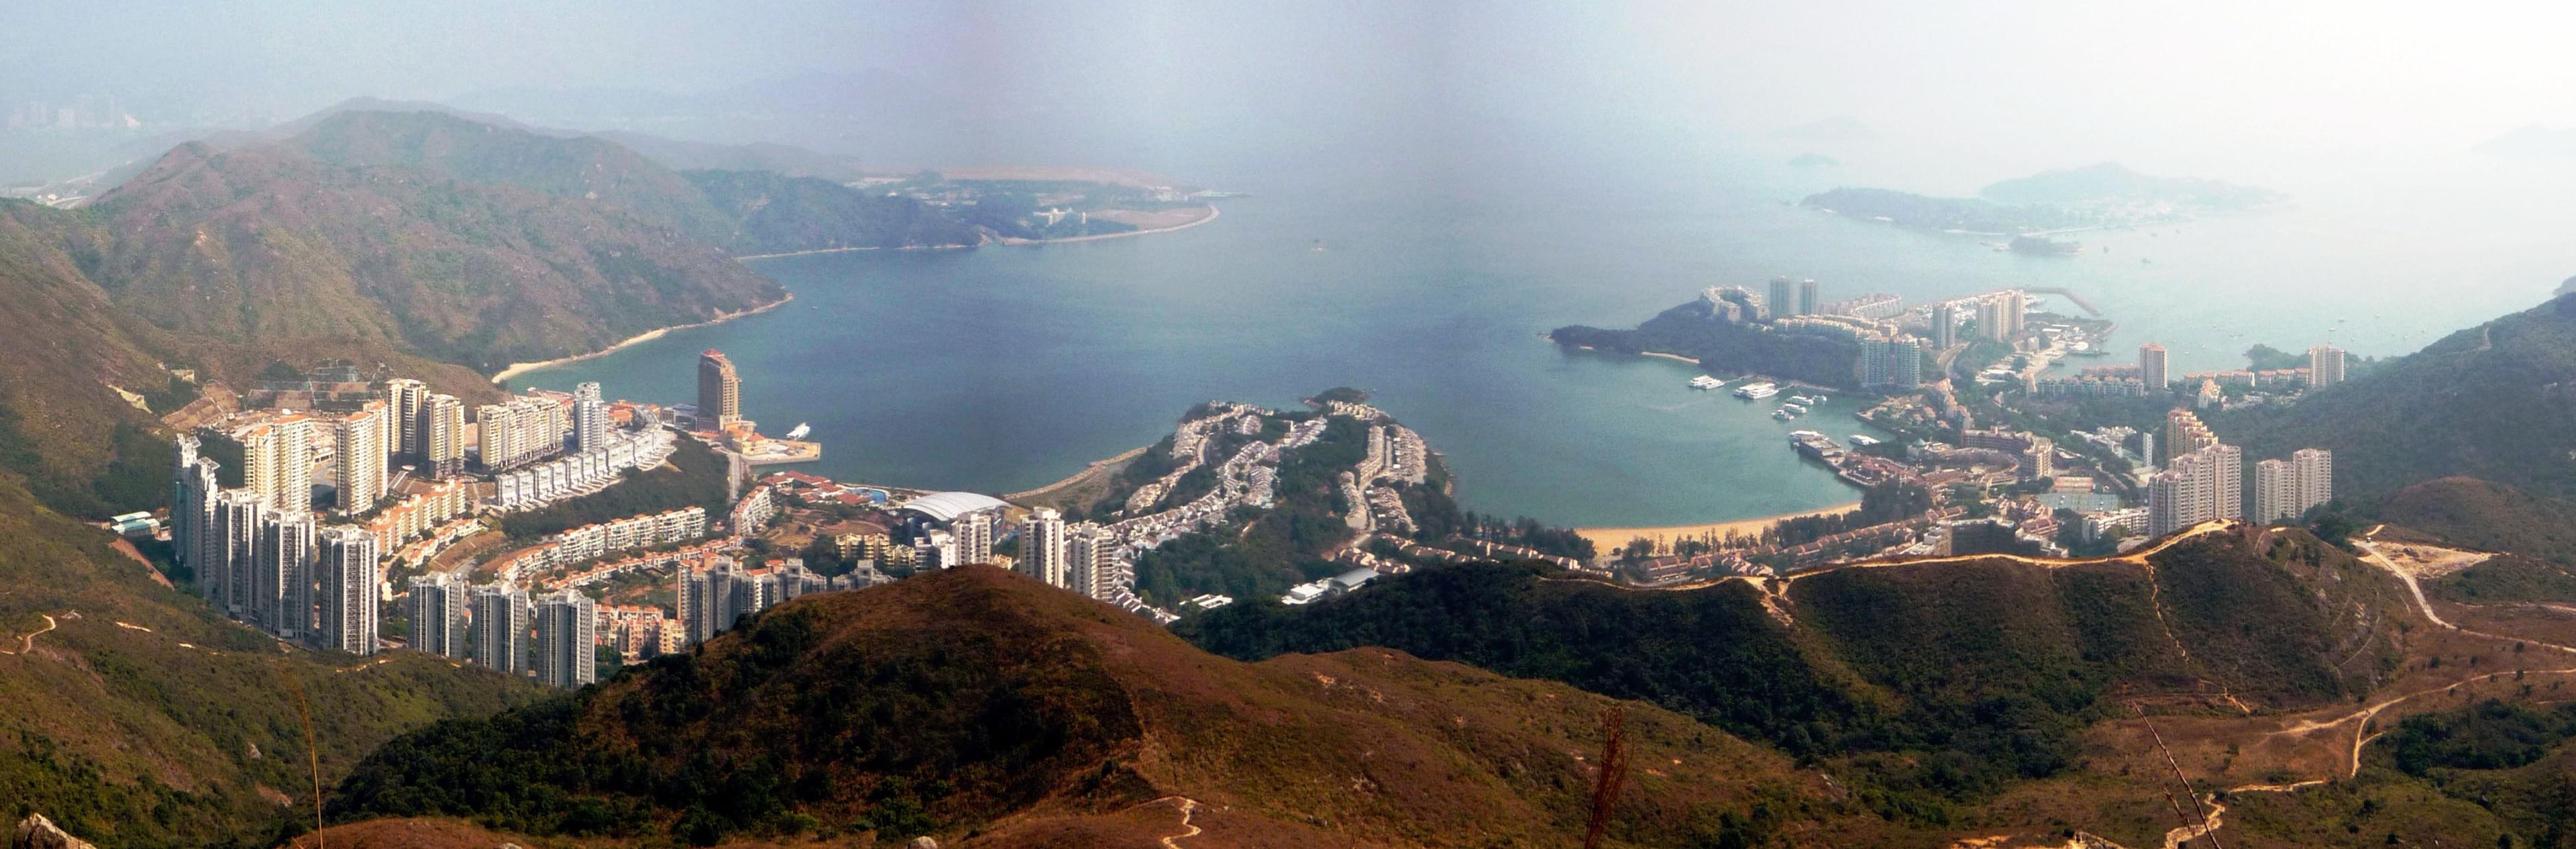 Discovery Bay, Islands District, Hong Kong SAR